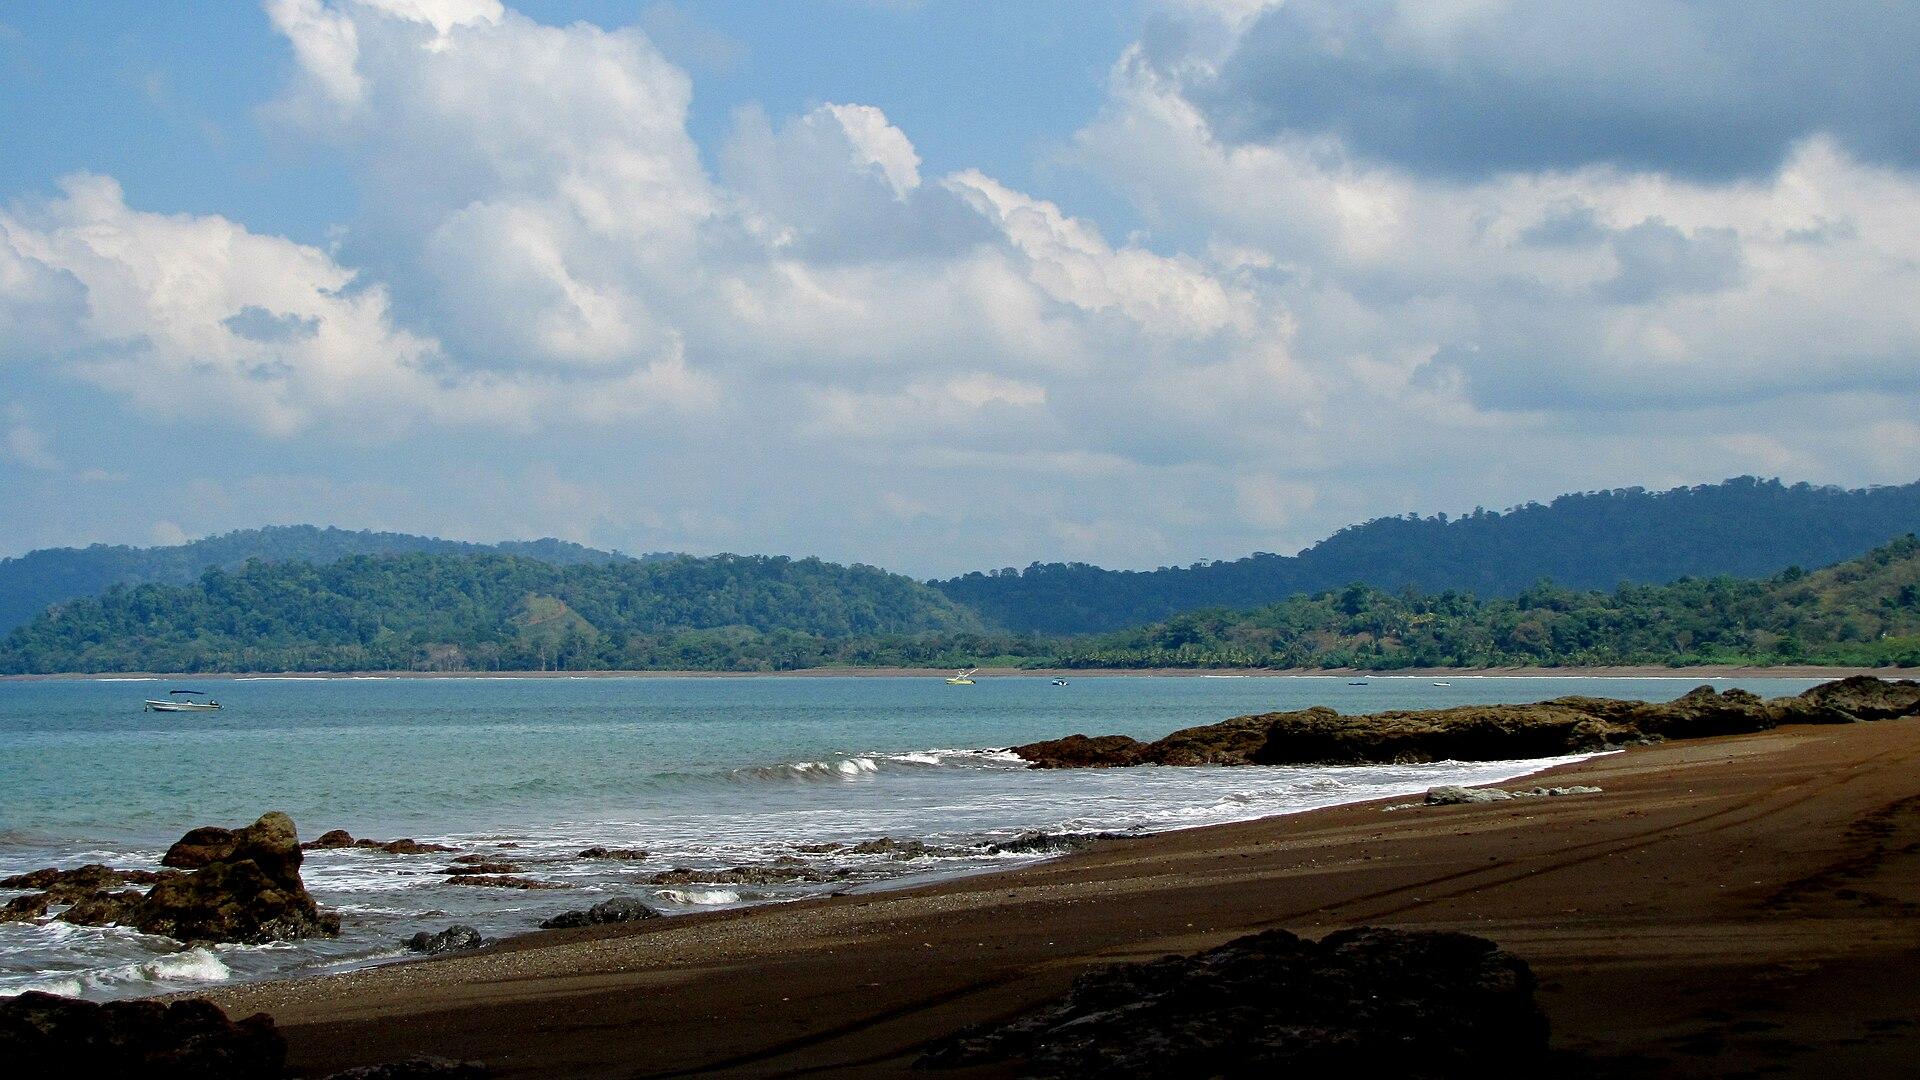 4X4 Off Road >> Bahía Drake - Wikipedia